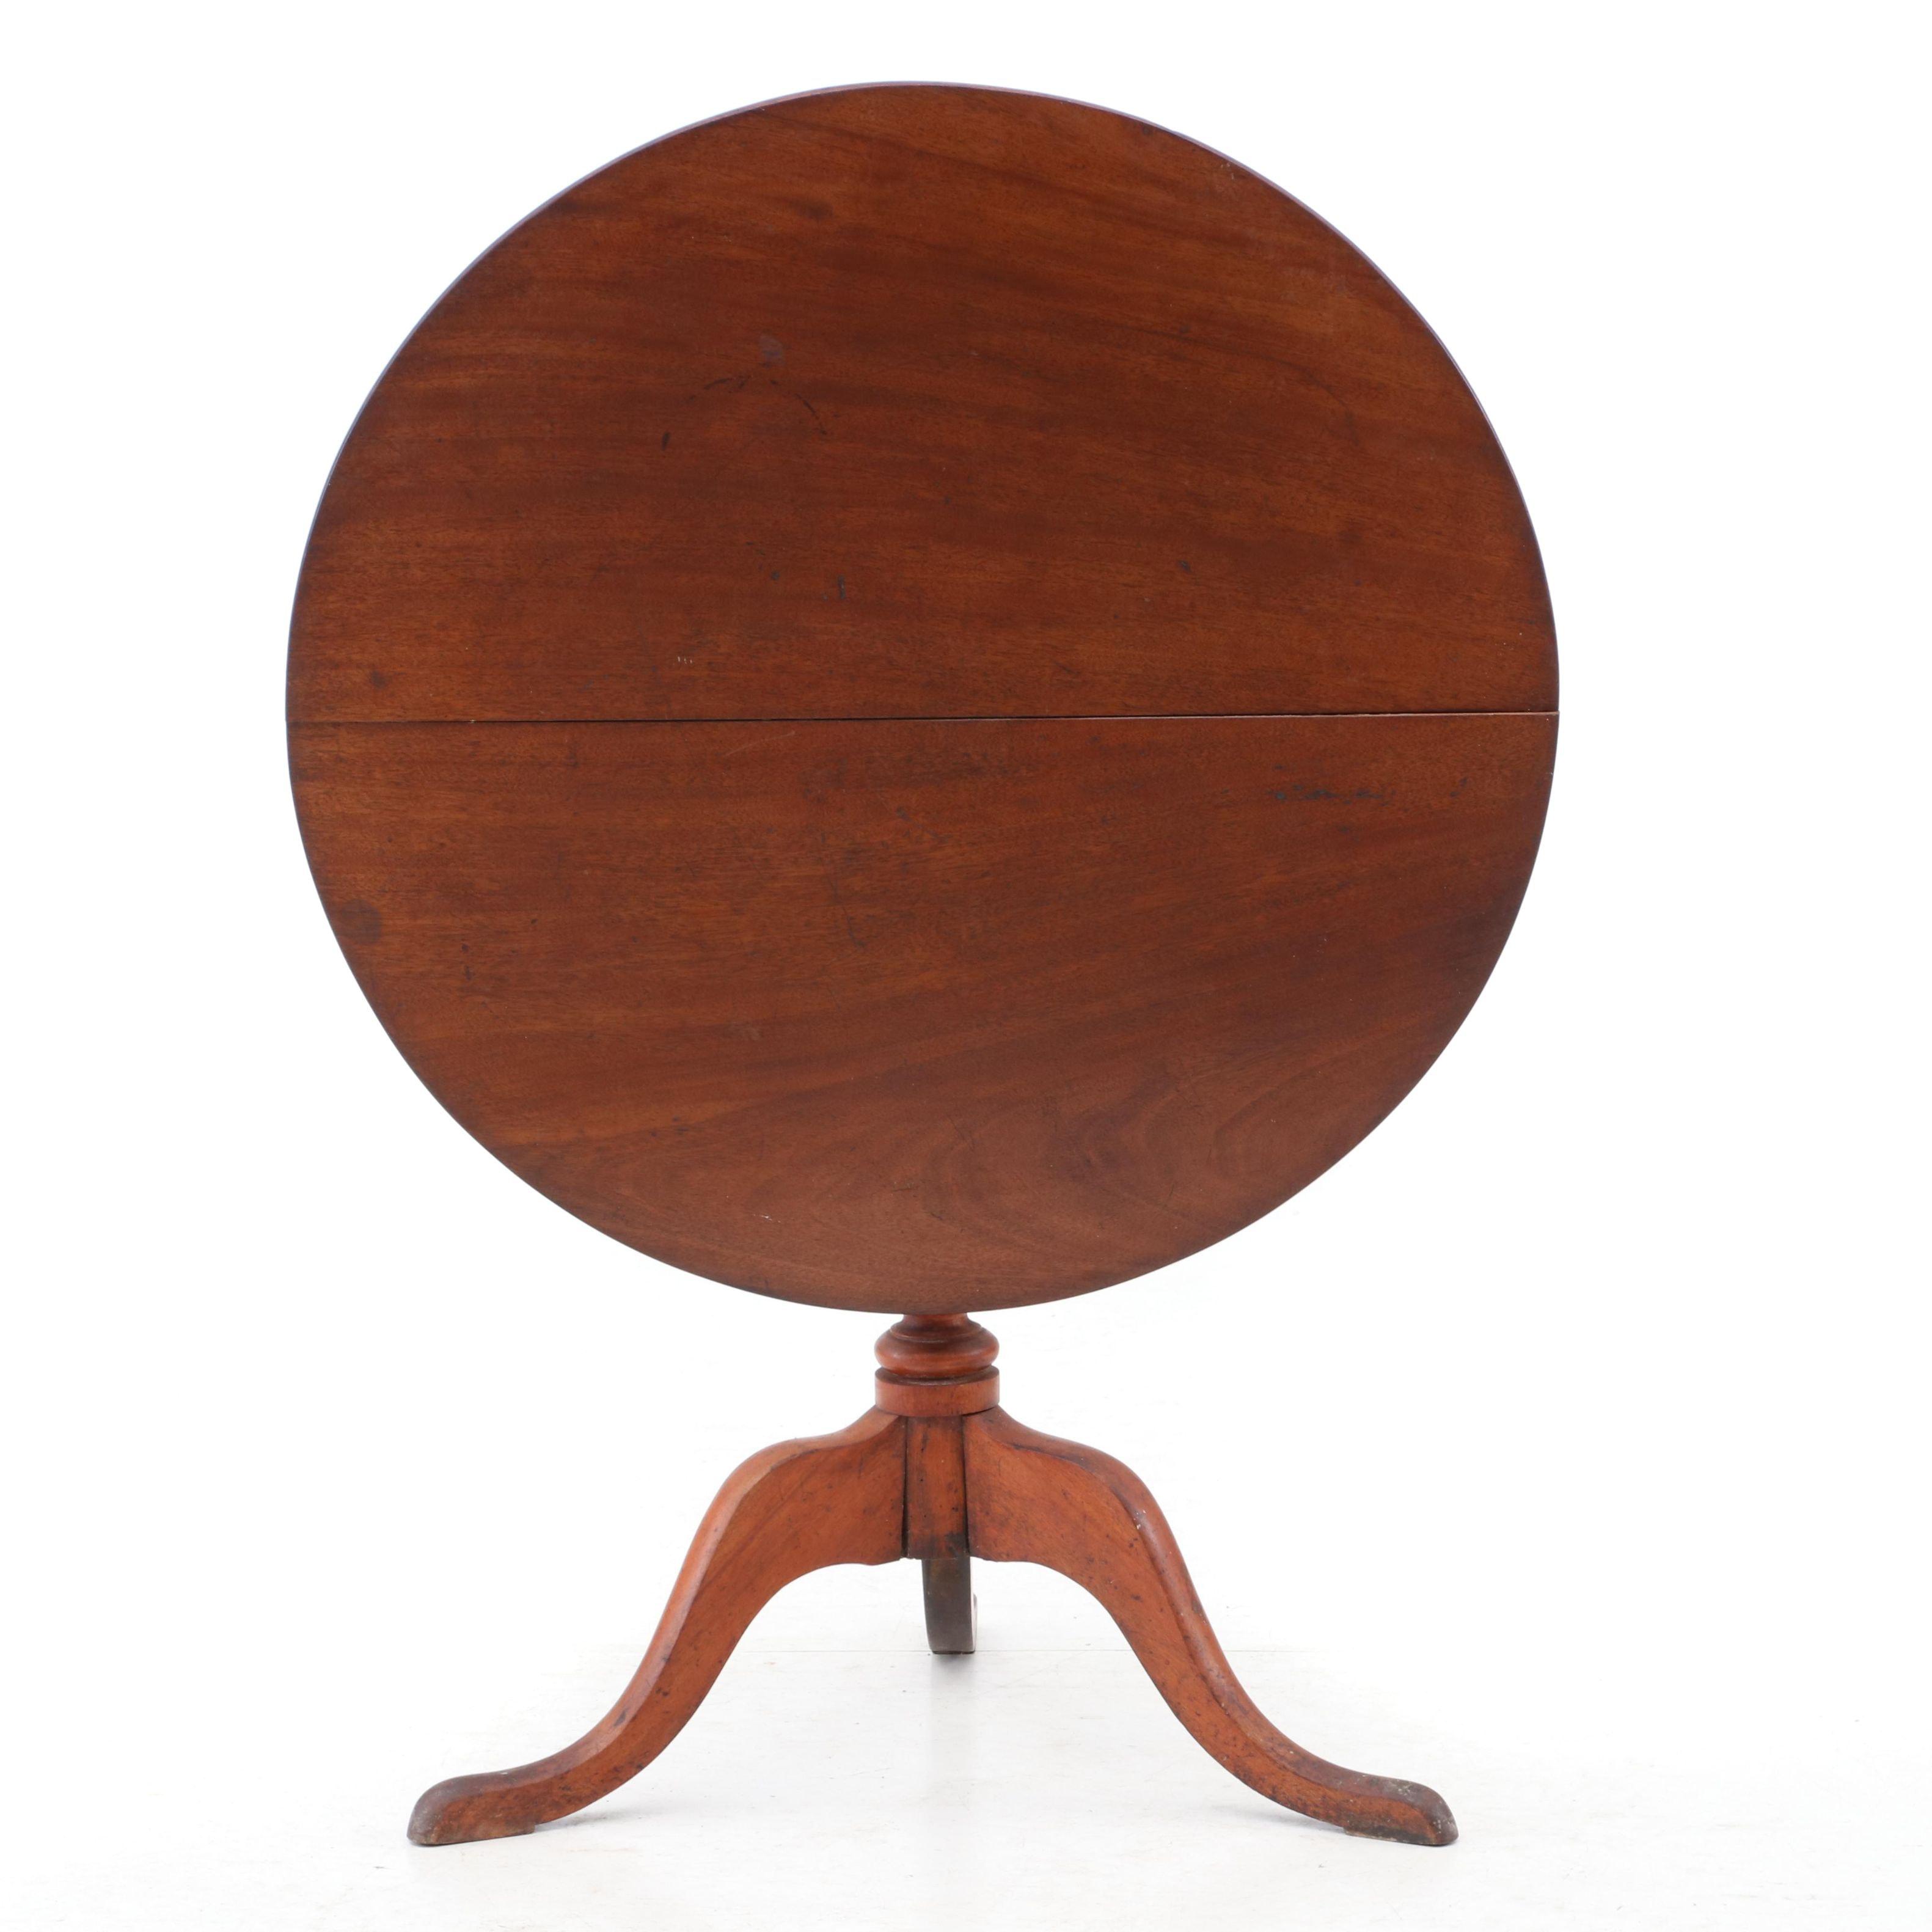 Late 18th Century Mahogany Tilt Top Table